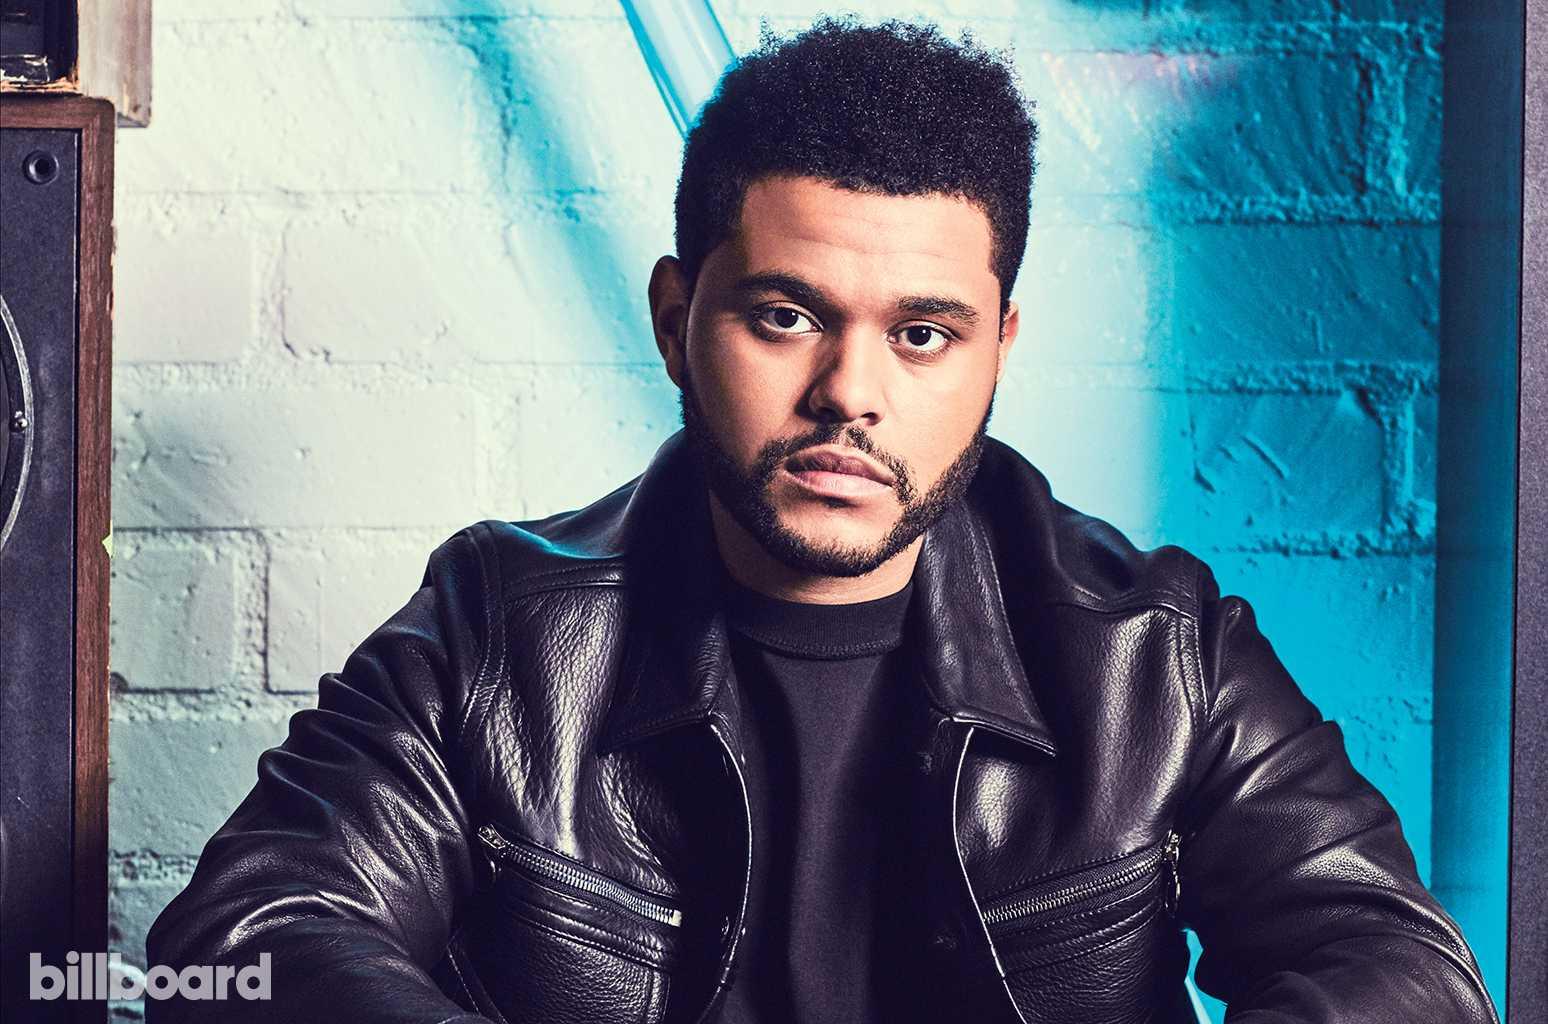 The Weeknd Celebrates His Birthday In 'XO' Fashion | Weeknd